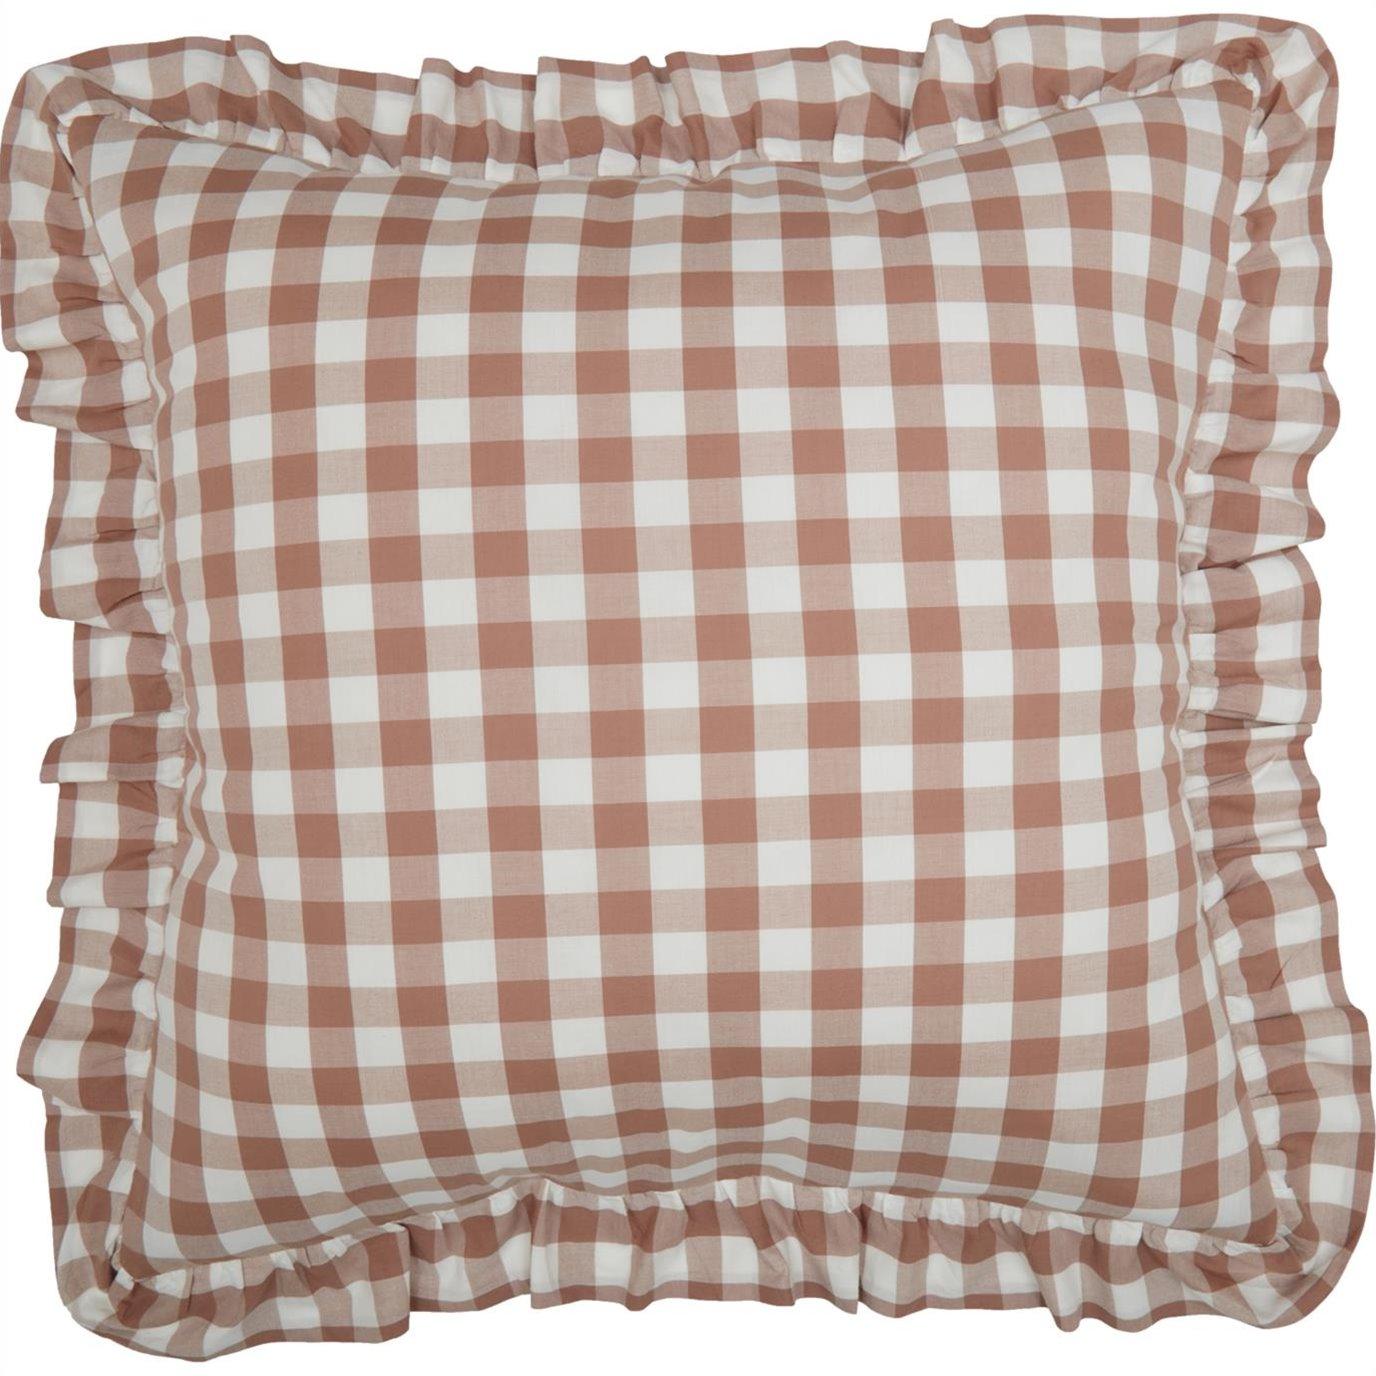 Annie Buffalo Portabella Check Fabric Euro Sham 26x26